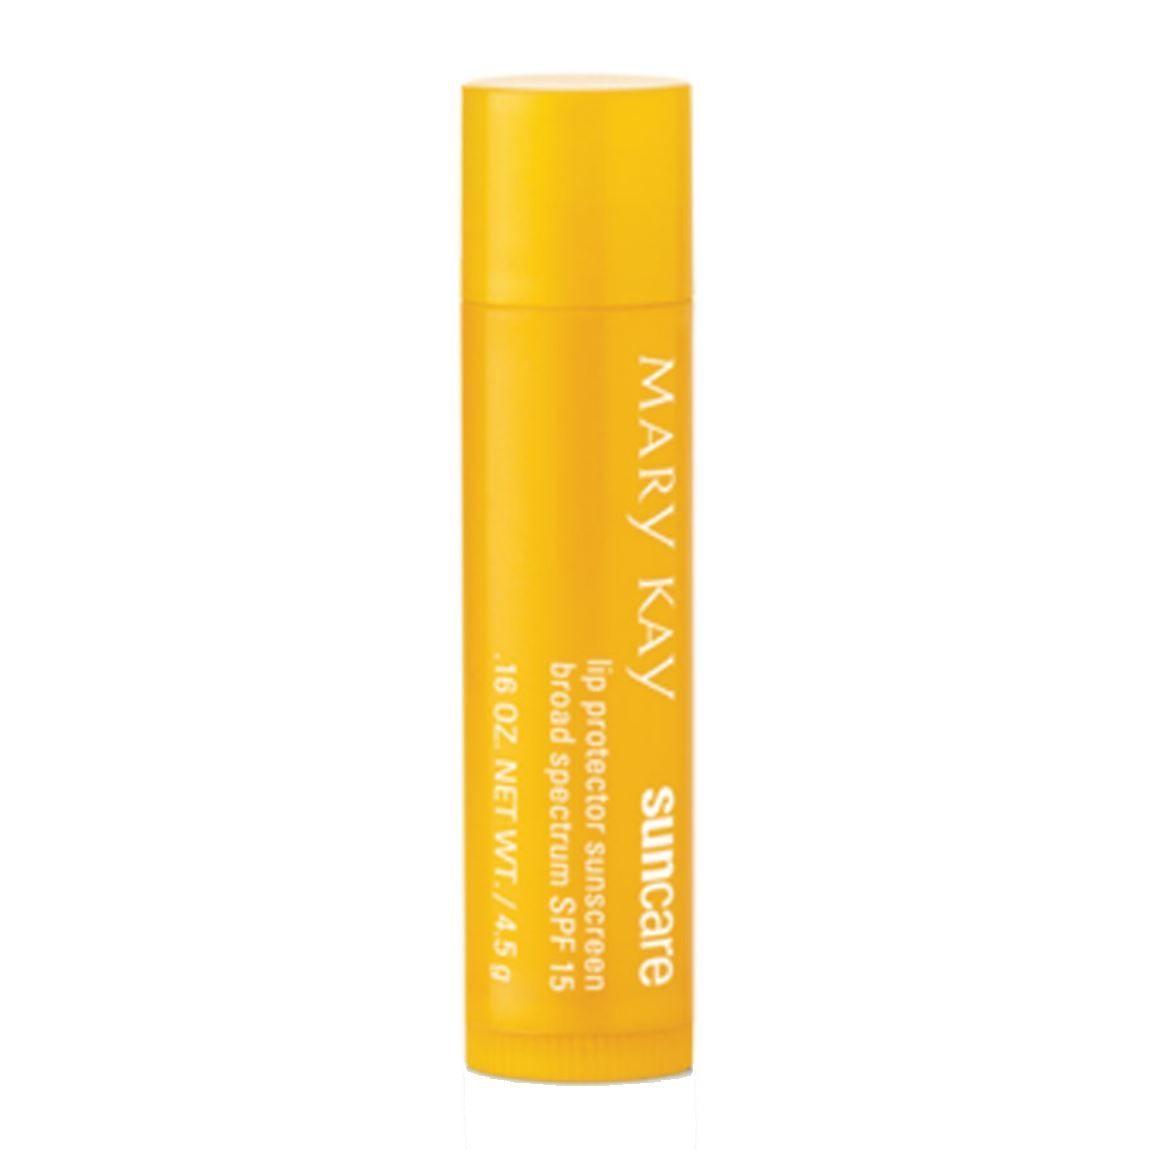 Mary Kay Lip Protector Sunscreen SPF 15 reviews photos ...